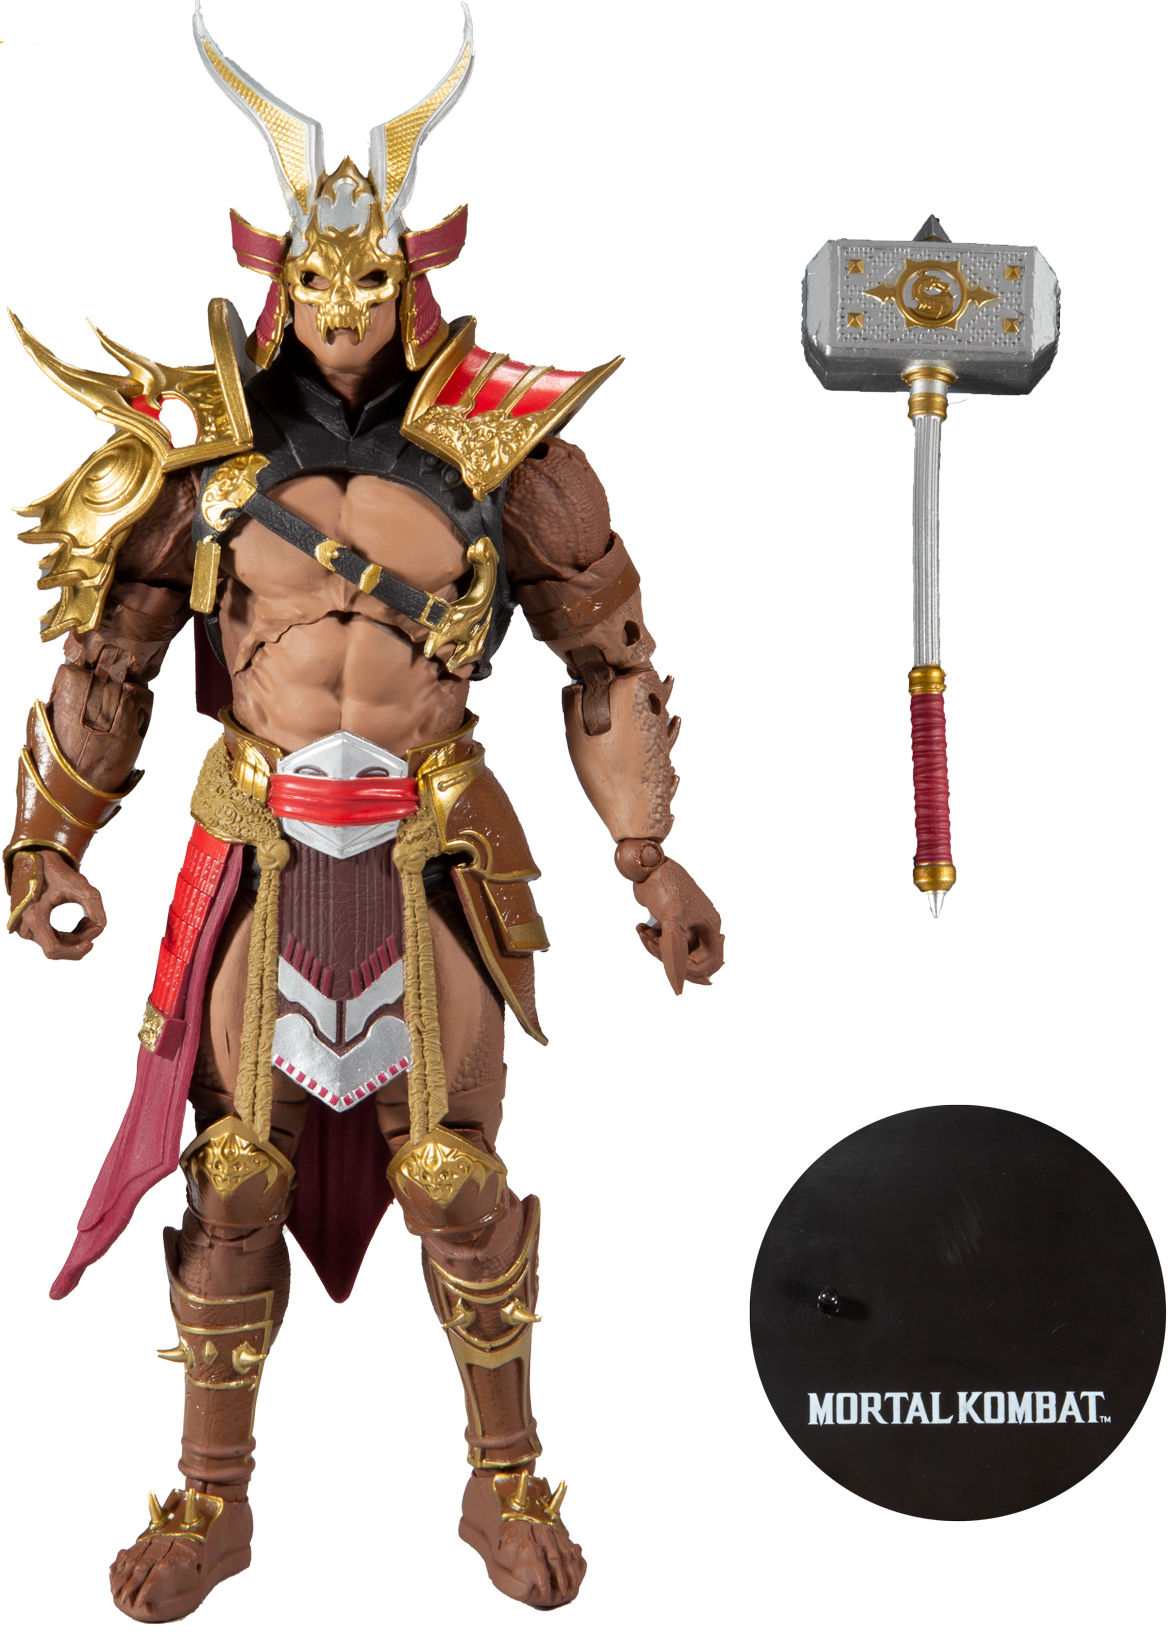 Фигурка Mortal Kombat: Shao Kahn Action Figure Action Figure (17 см)